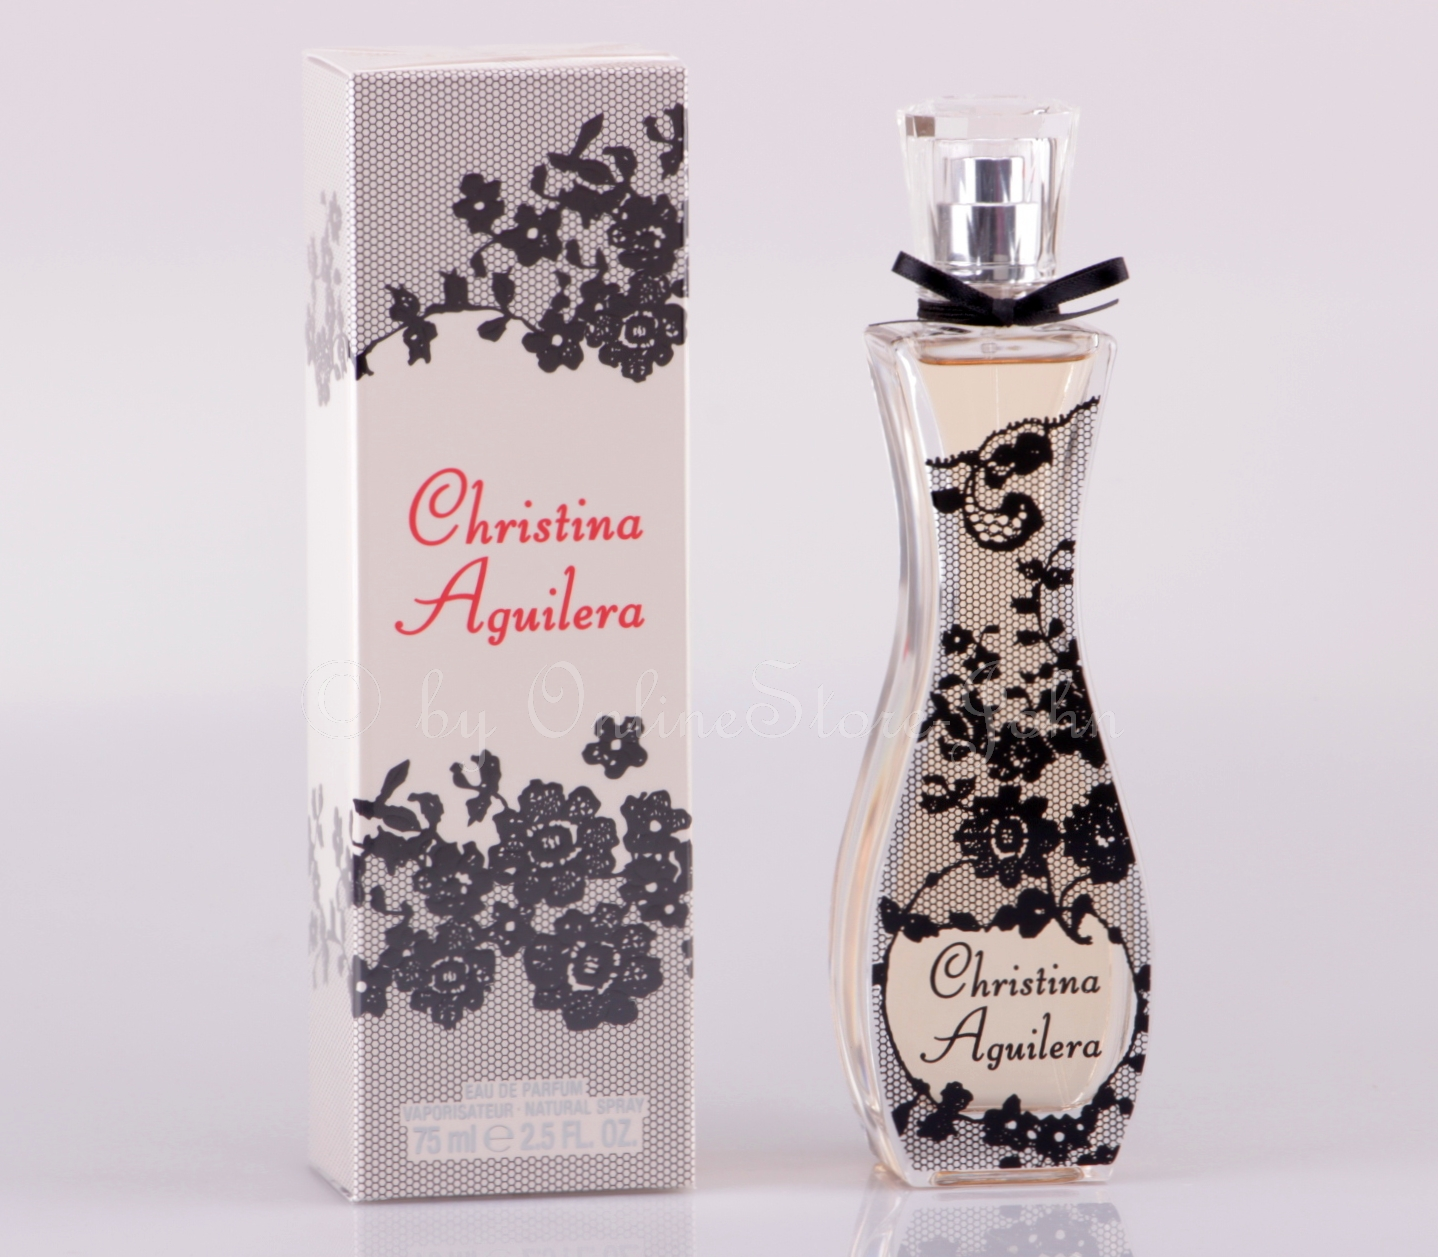 christina aguilera signature 75ml edp eau de parfum. Black Bedroom Furniture Sets. Home Design Ideas